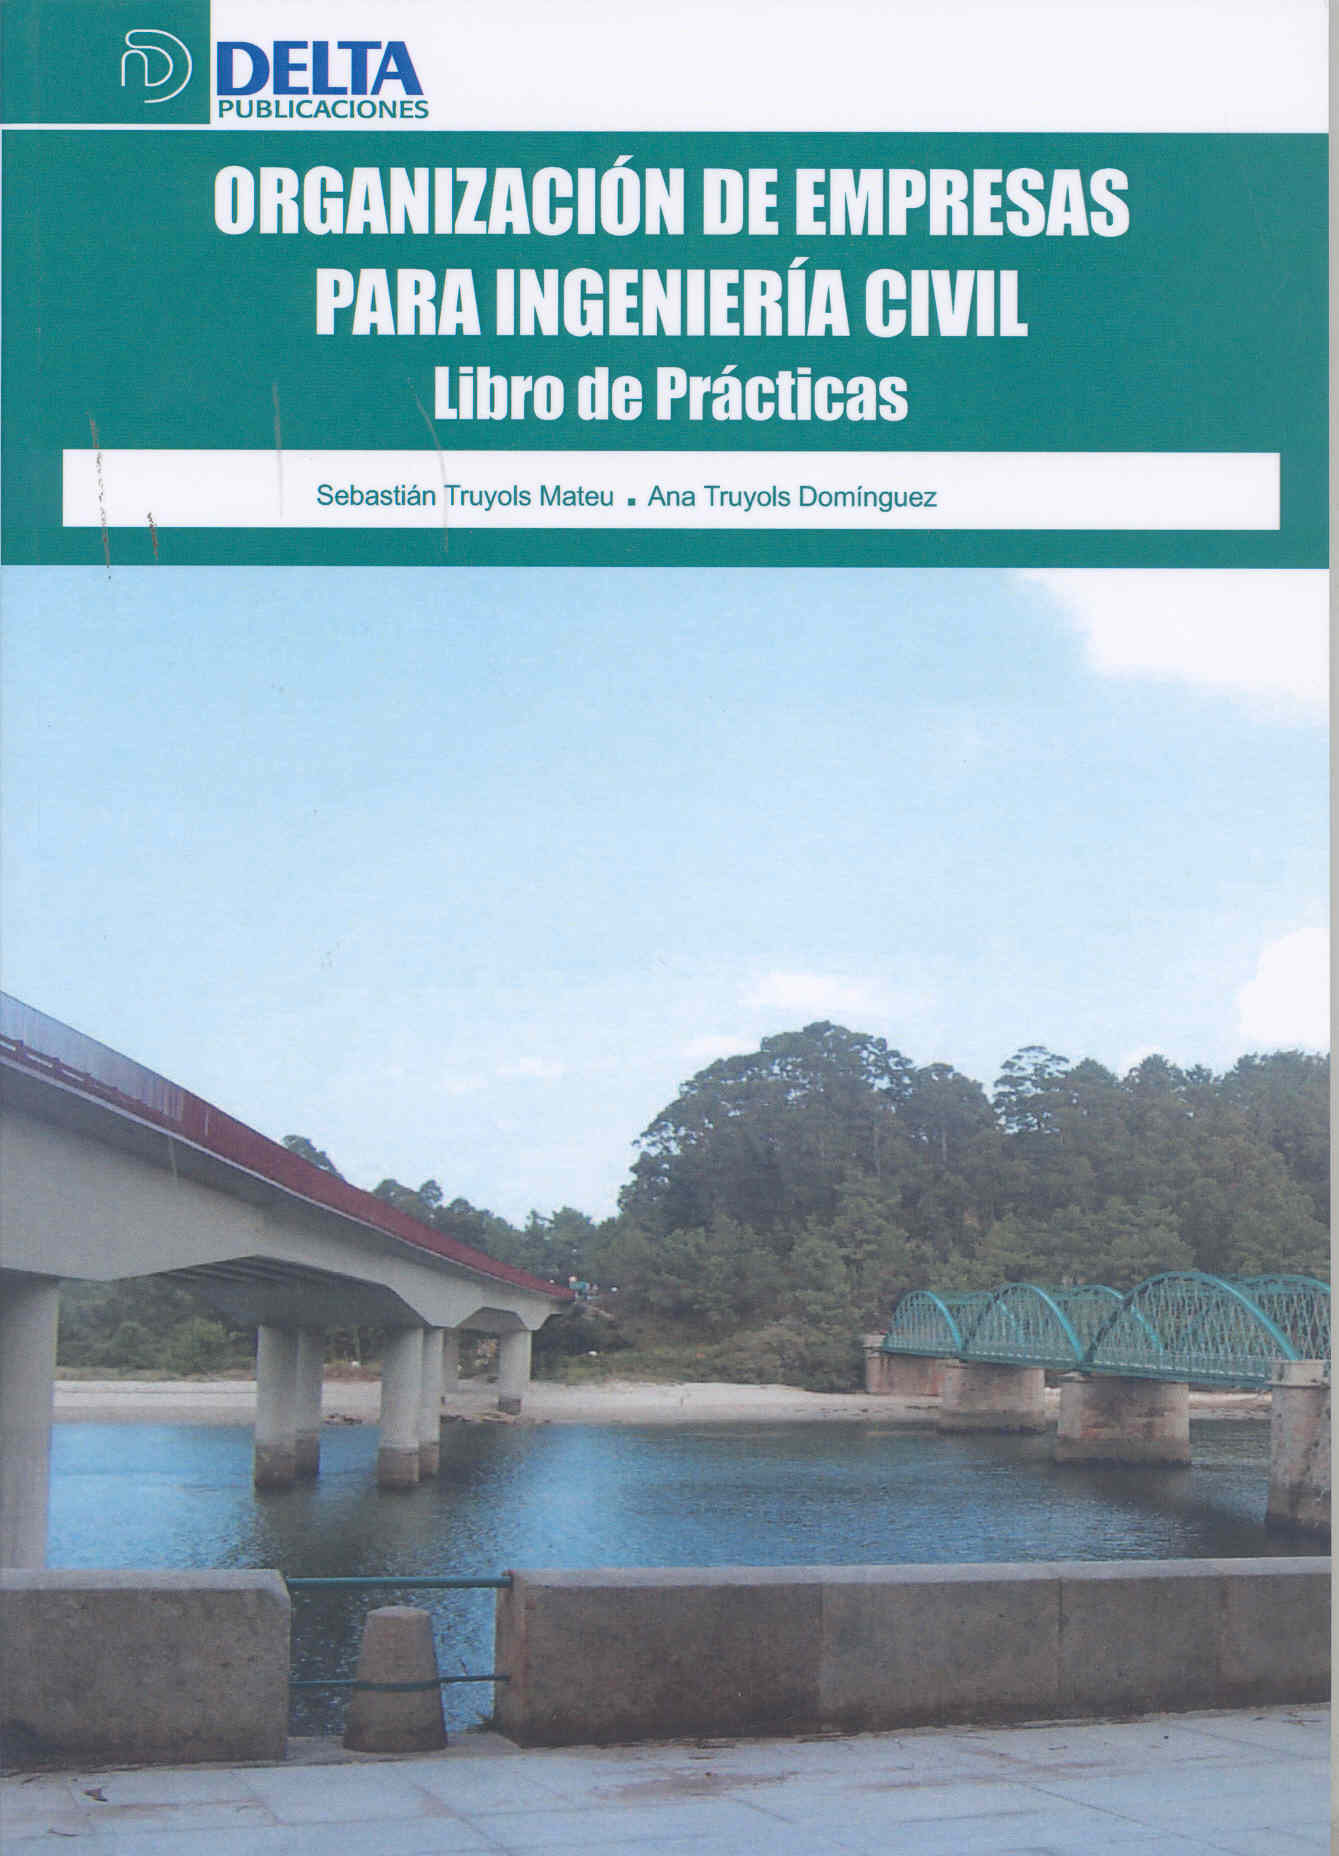 Organizacion De Empresas Para Ingenieria Civil:libro De Practicas por Sebastian Truyols Mateu epub